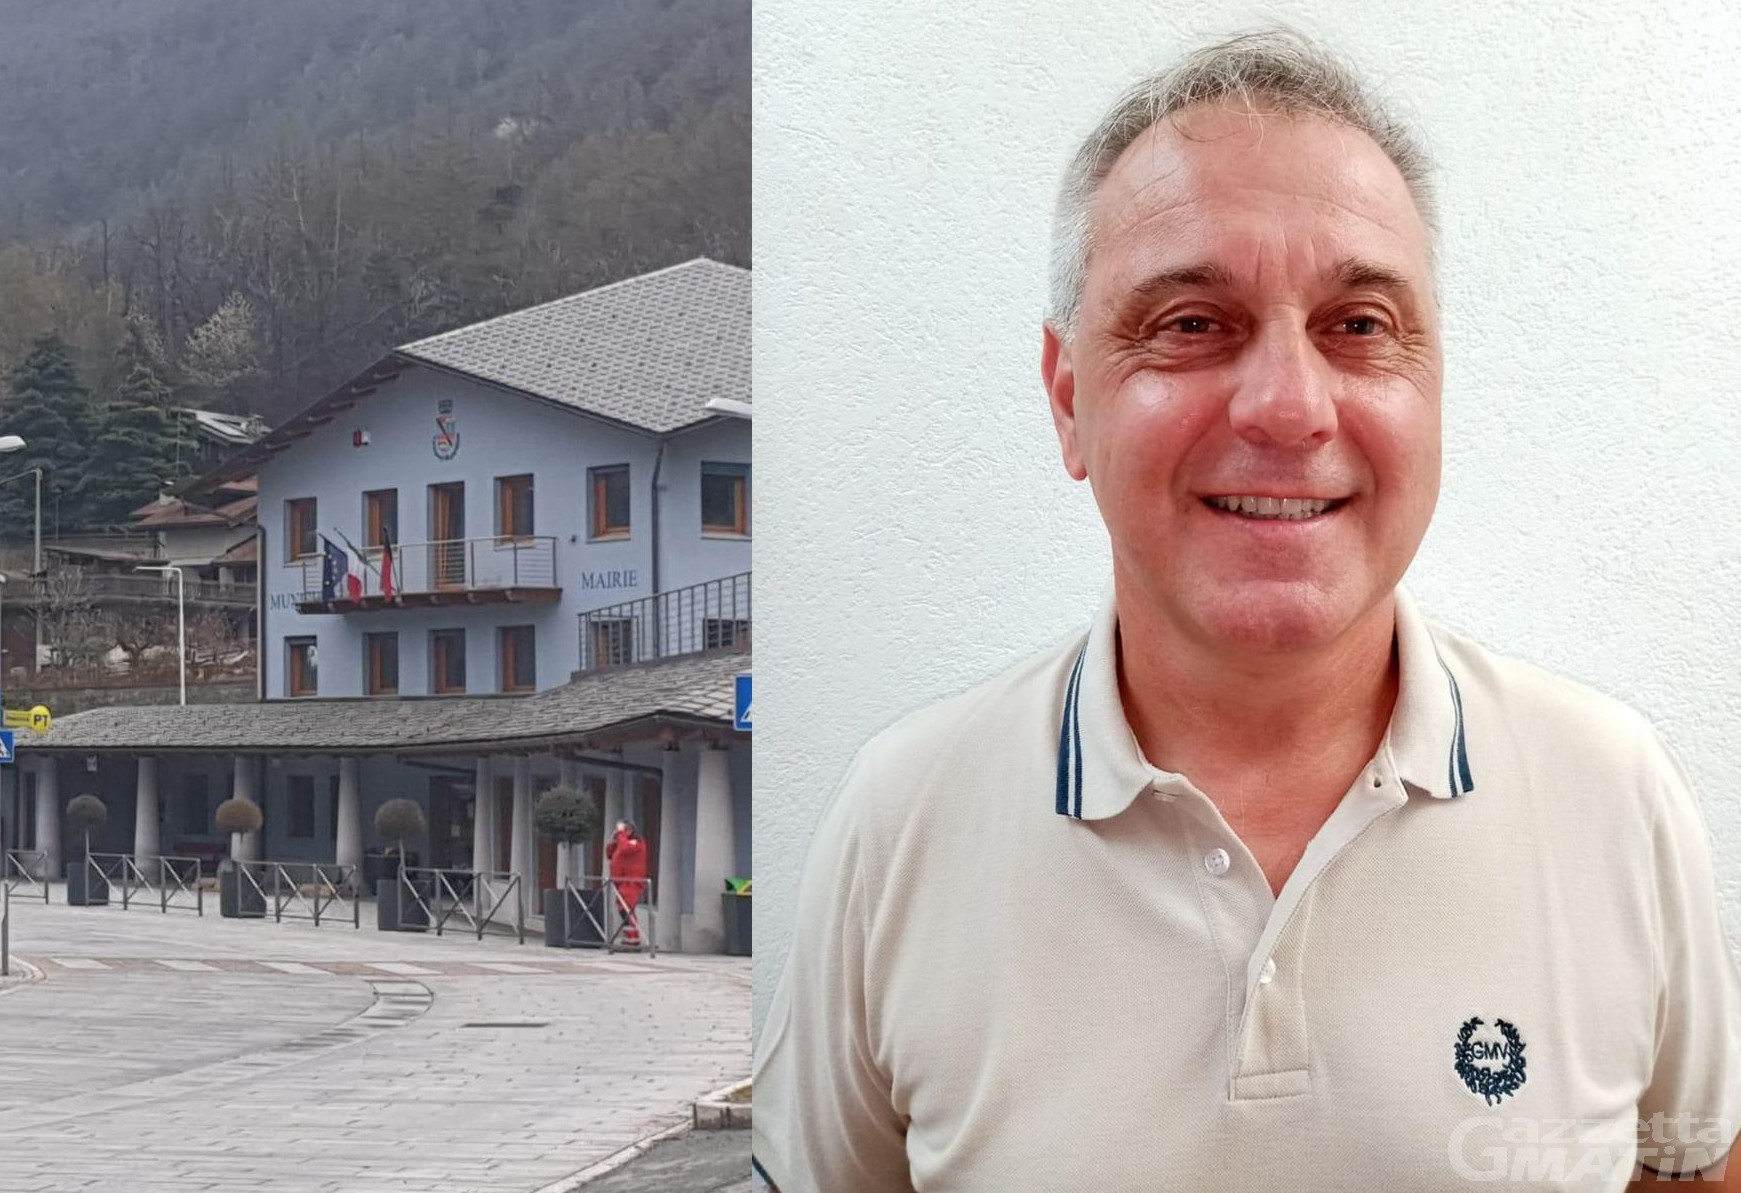 Lutto: è morto Paolo Fary, candidato vicesindaco a Pontey